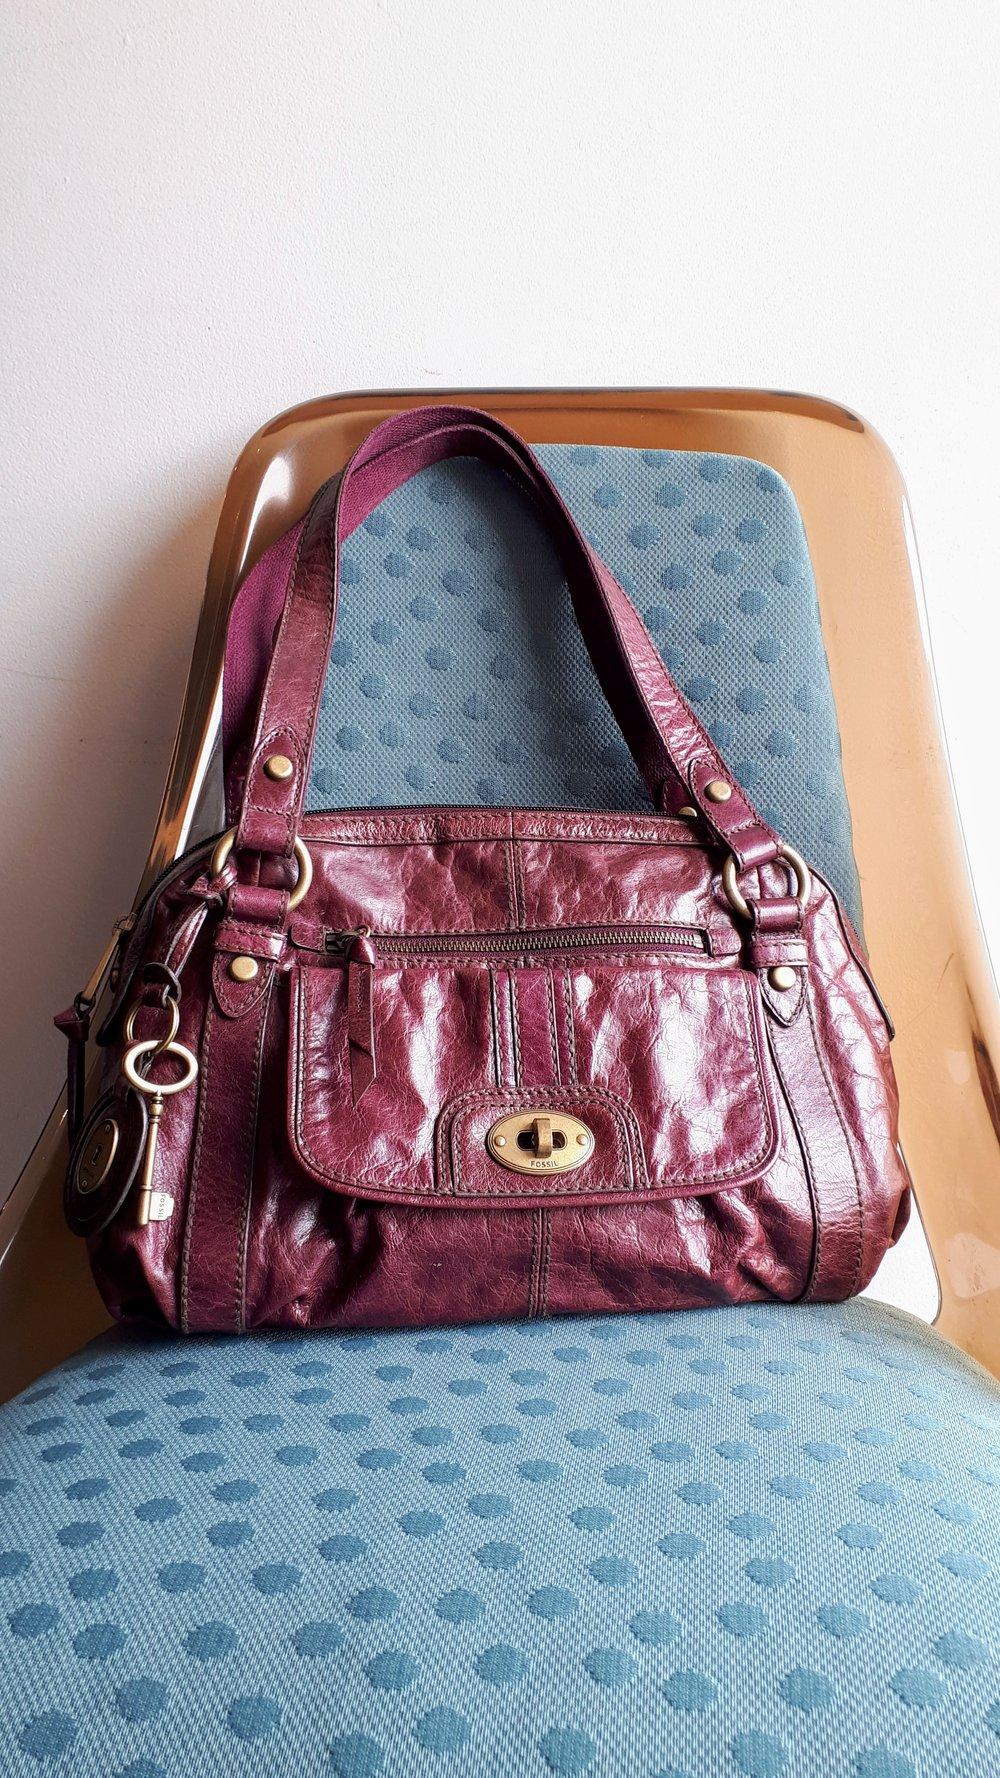 Fossil purse, $62